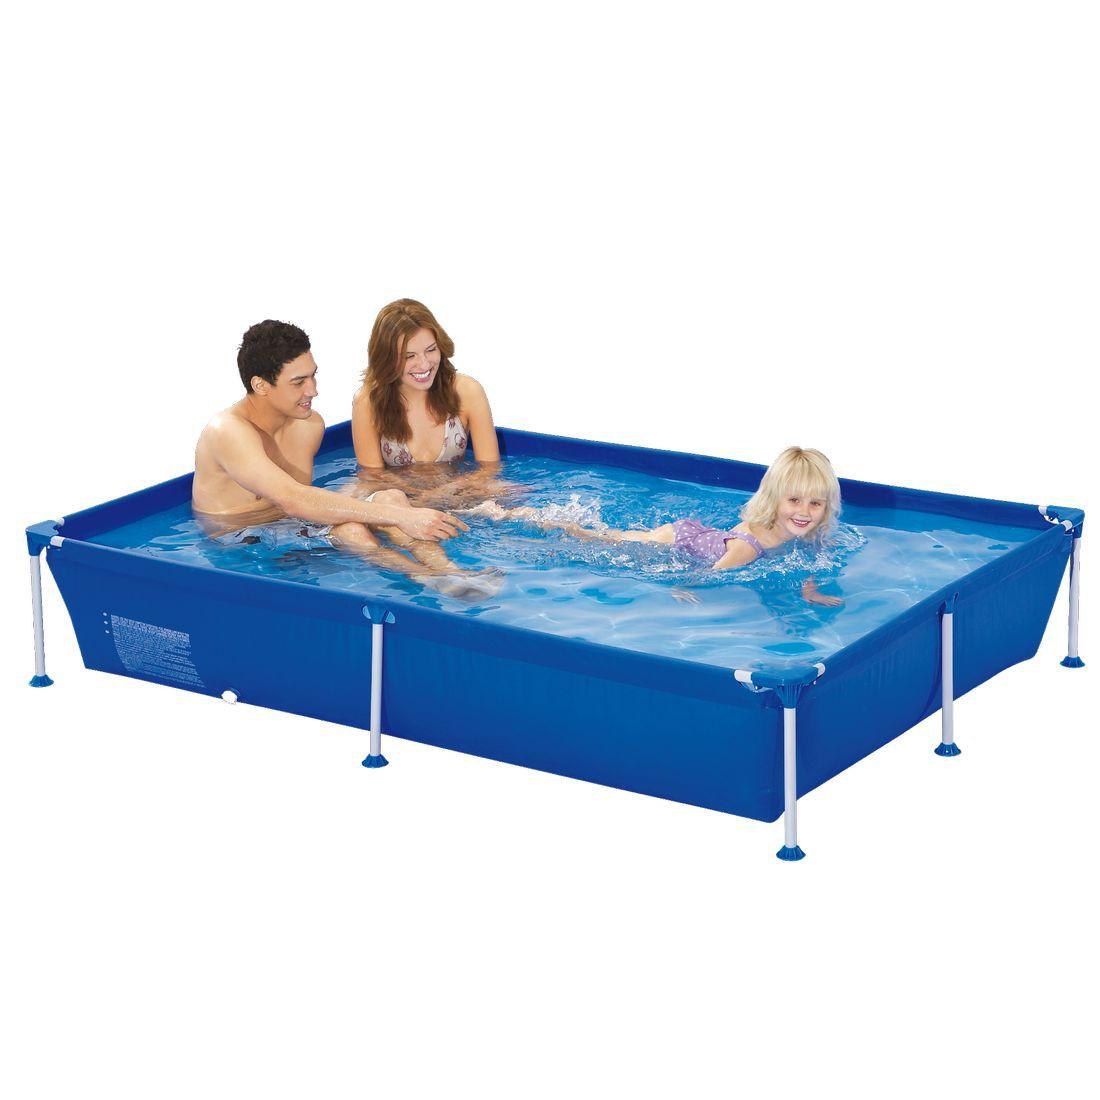 Achetez jilong passaat blue 228 piscine cadre en acier for Piscine rectangulaire acier